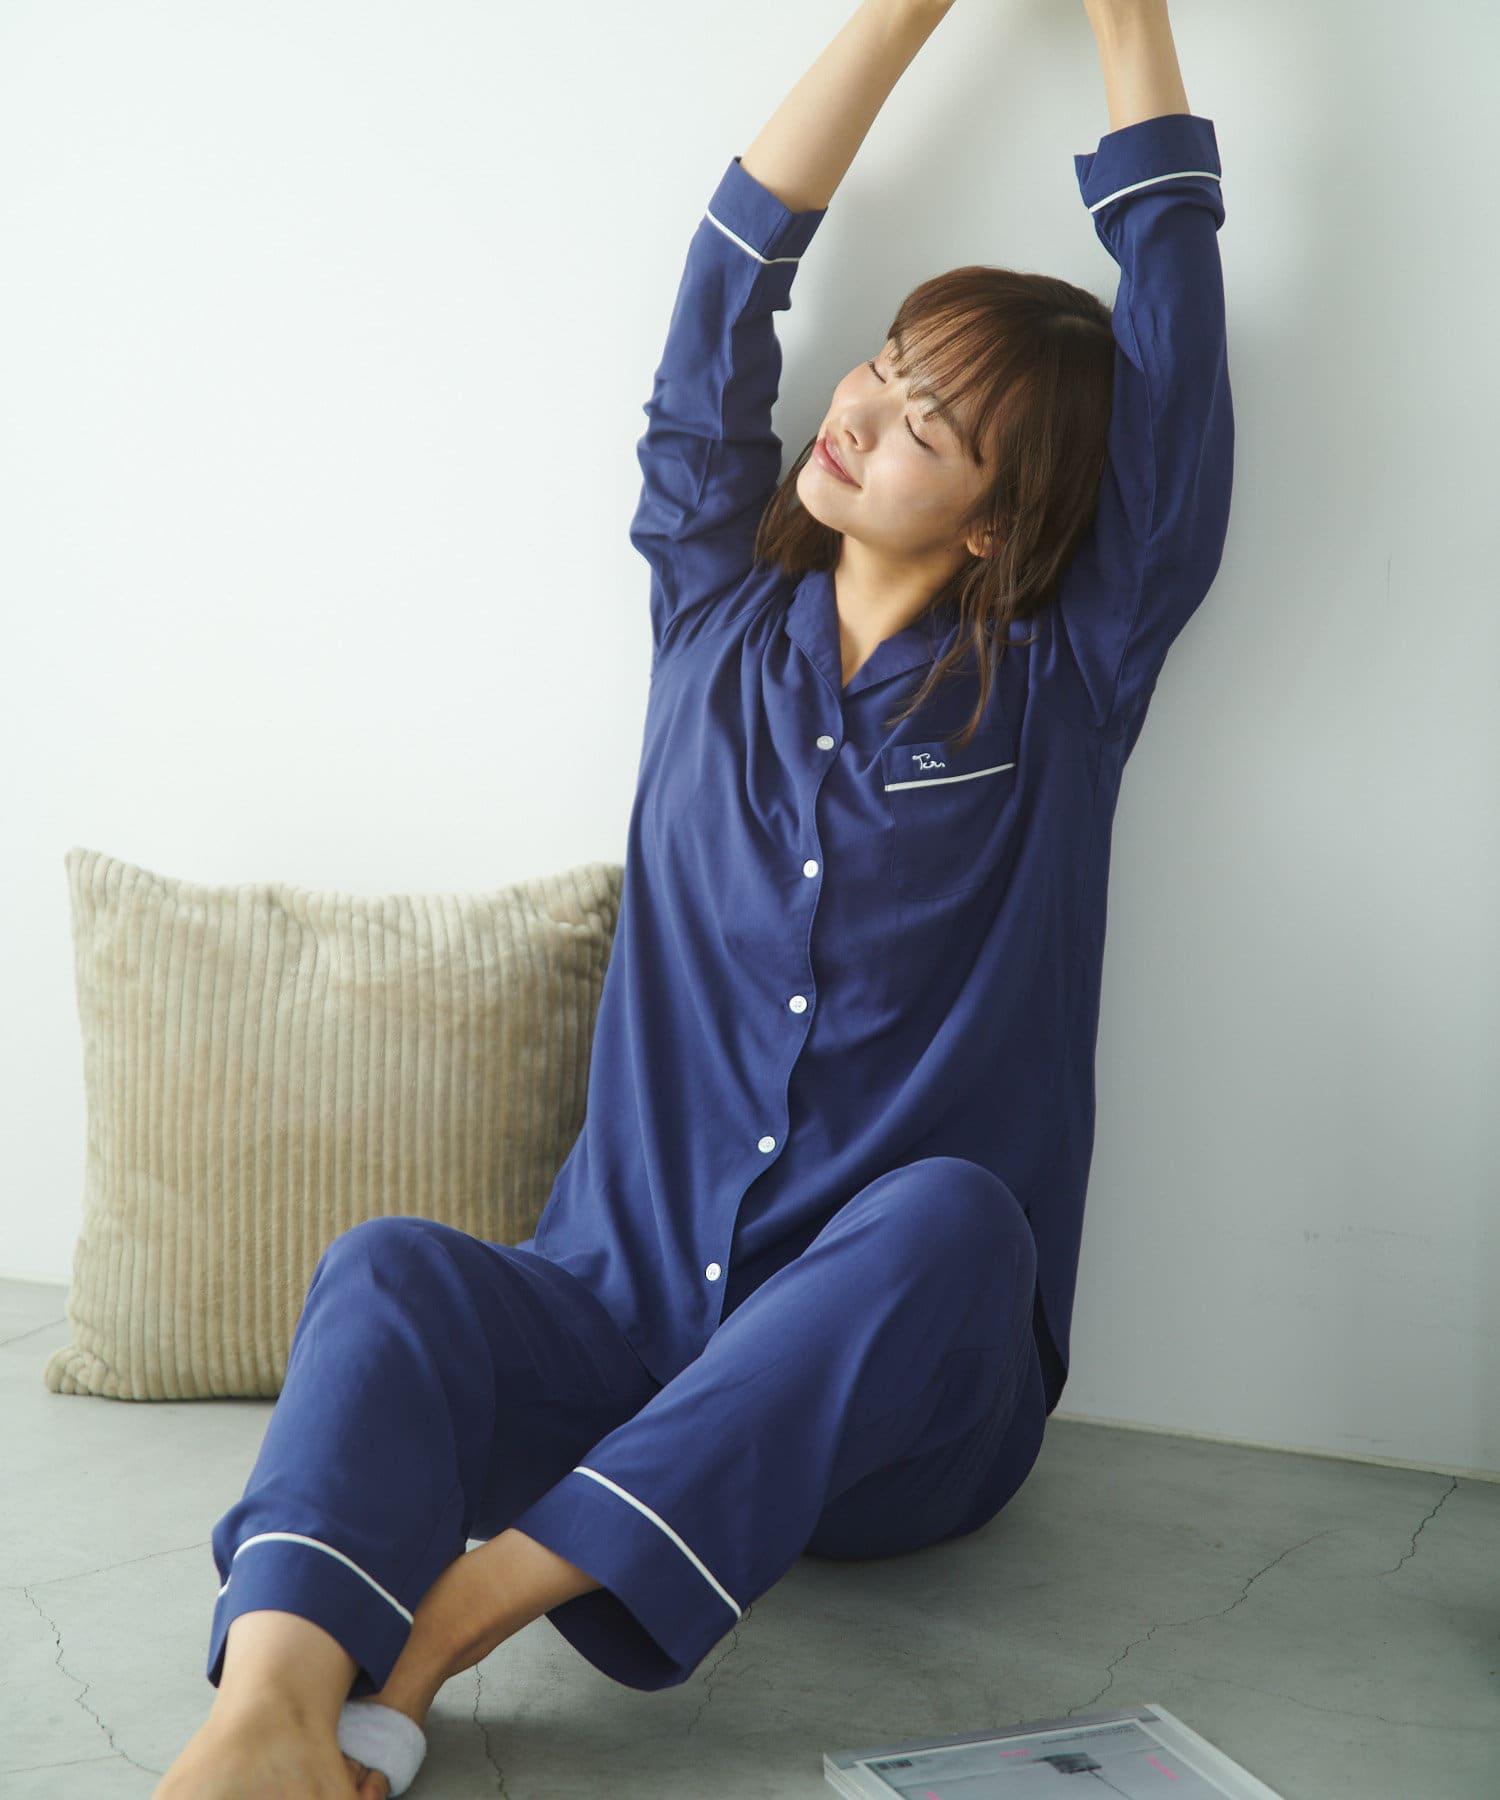 TERRITOIRE(テリトワール) 【しあわせな眠りを】LADIES快眠リラックスパジャマ 上下セット